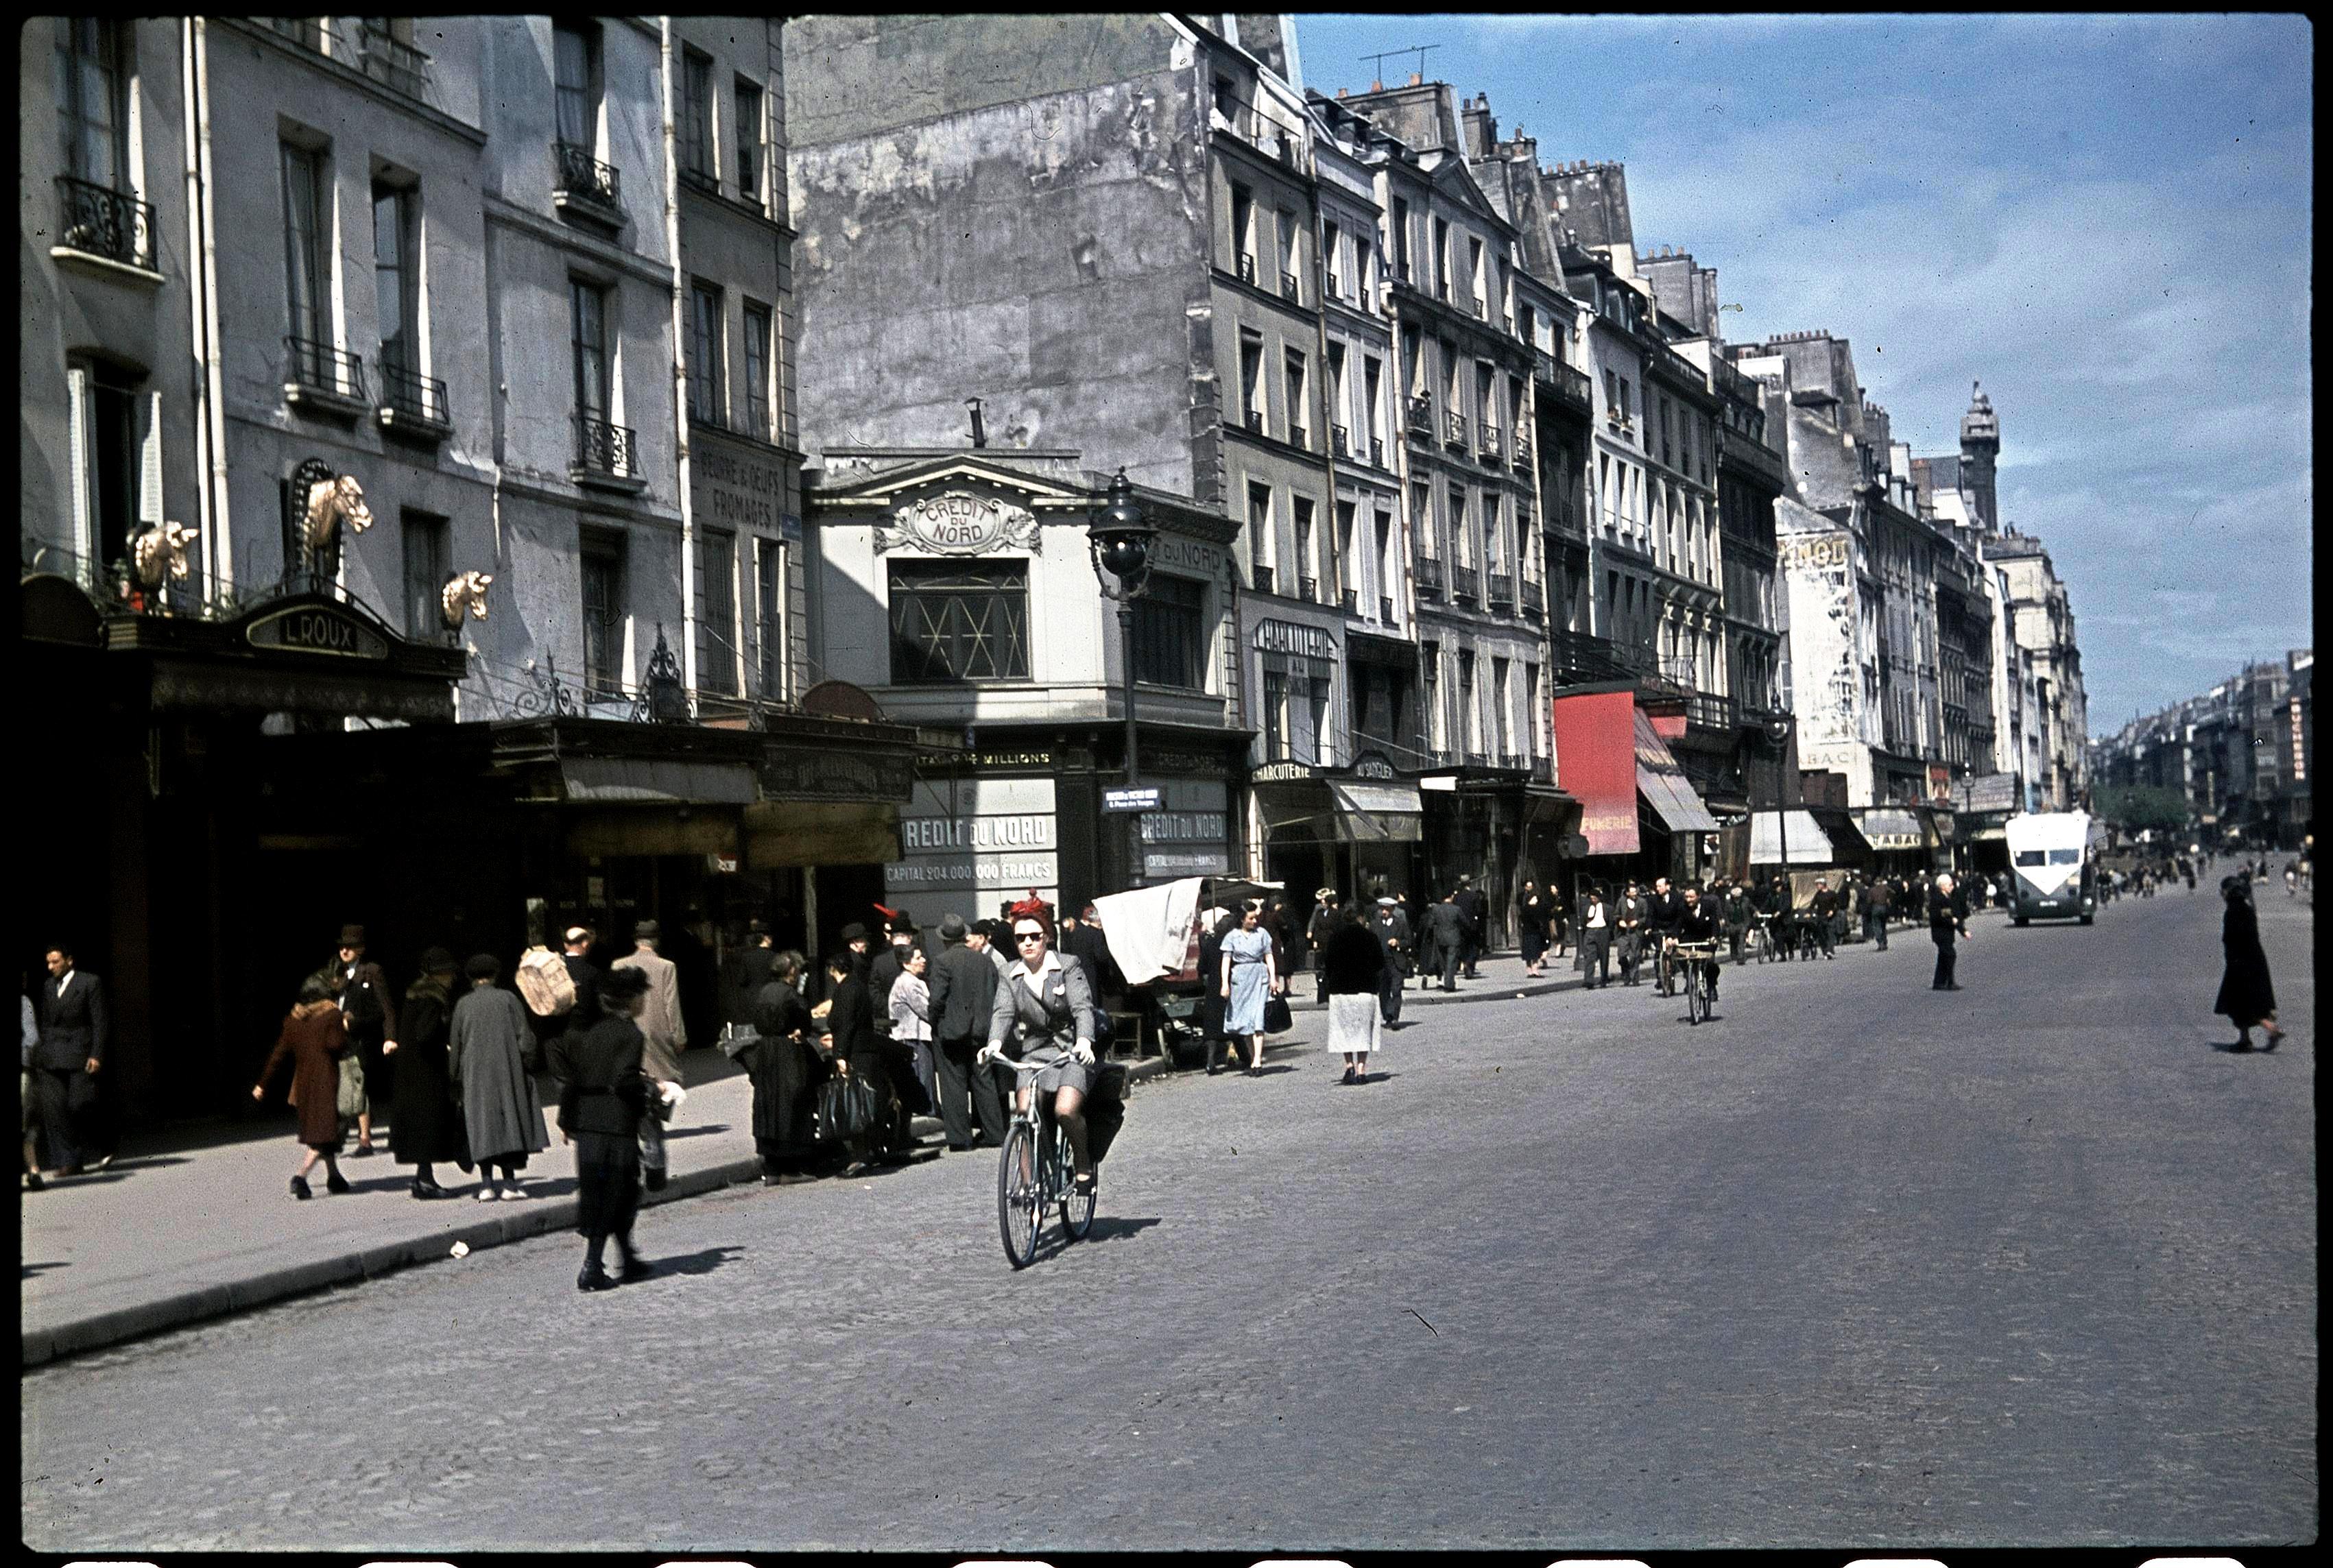 Улица Фобур Сент-Антуа́н